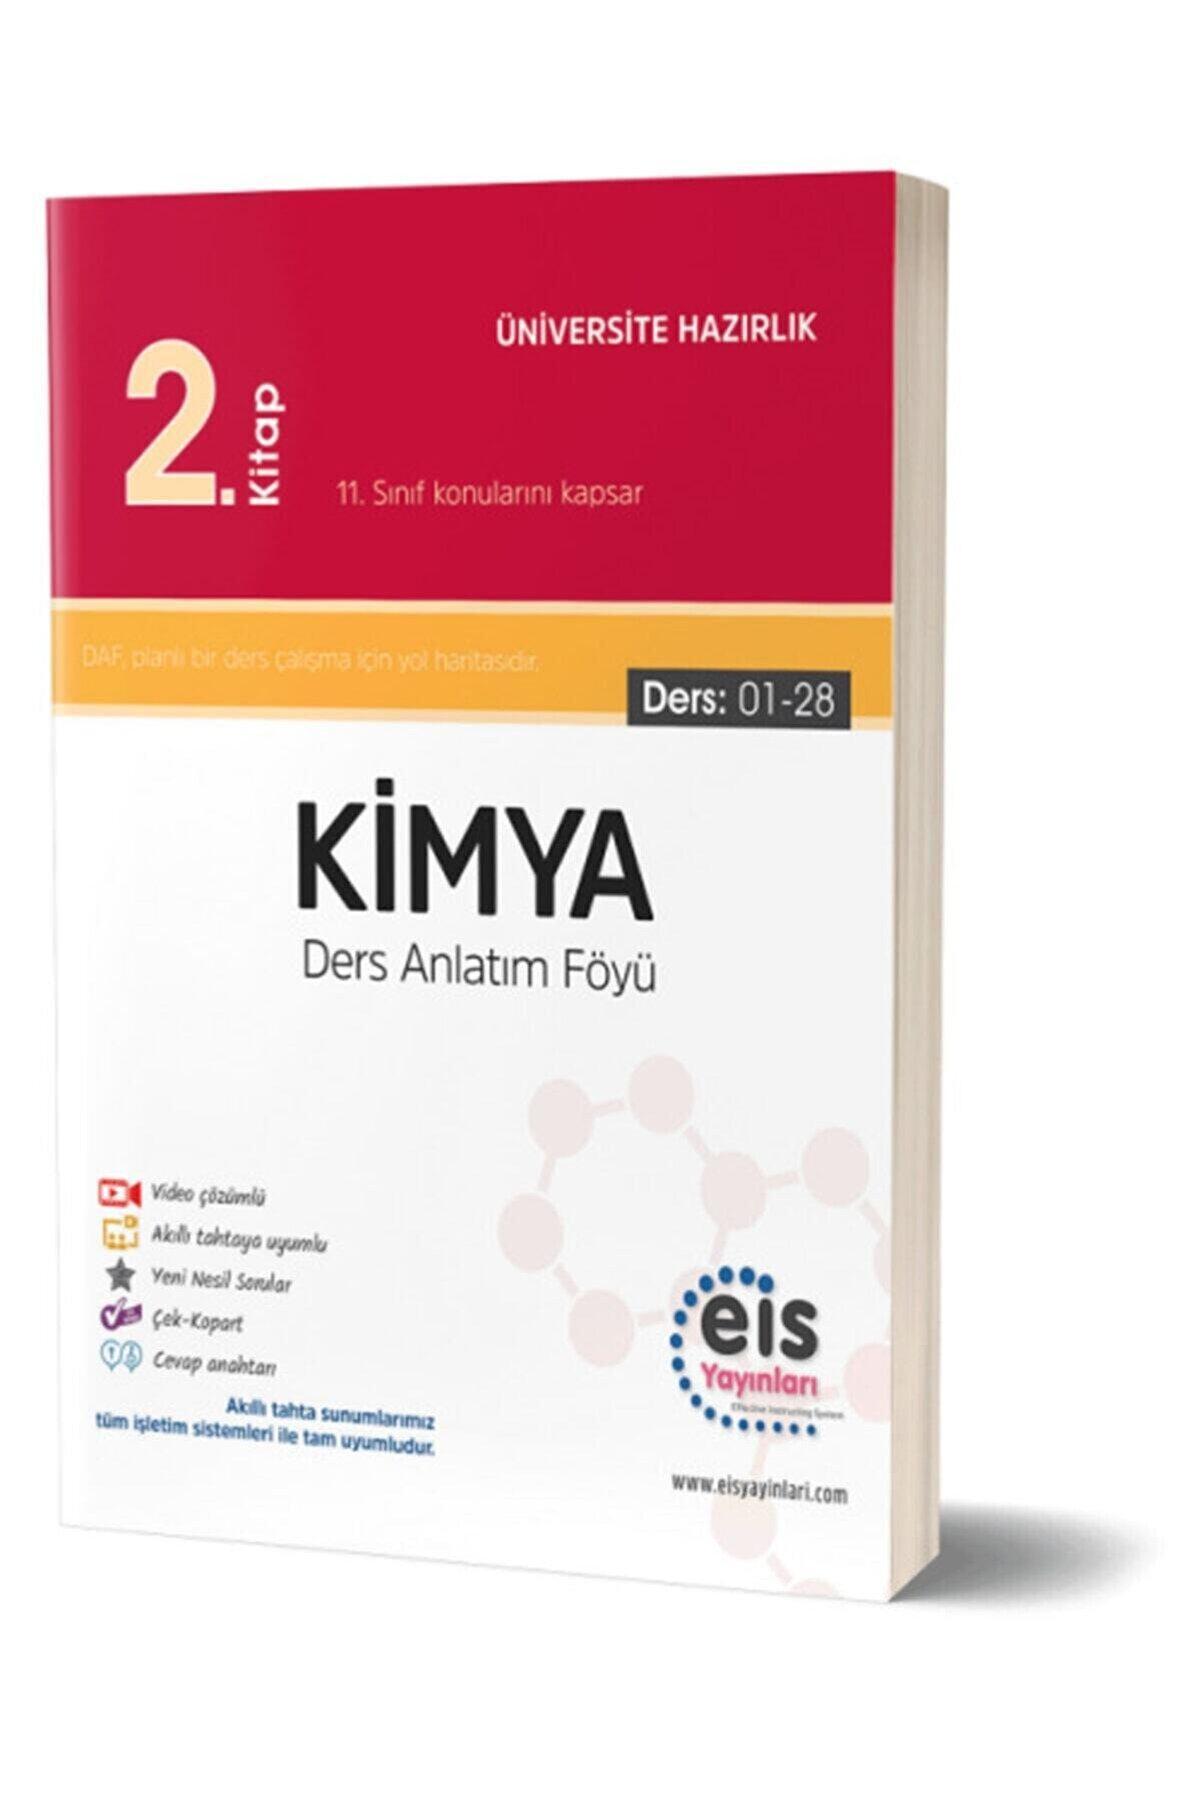 Eis Yayınları Eis Tyt Ayt Kimya Ders Anlatım Föyü Daf 2.kitap